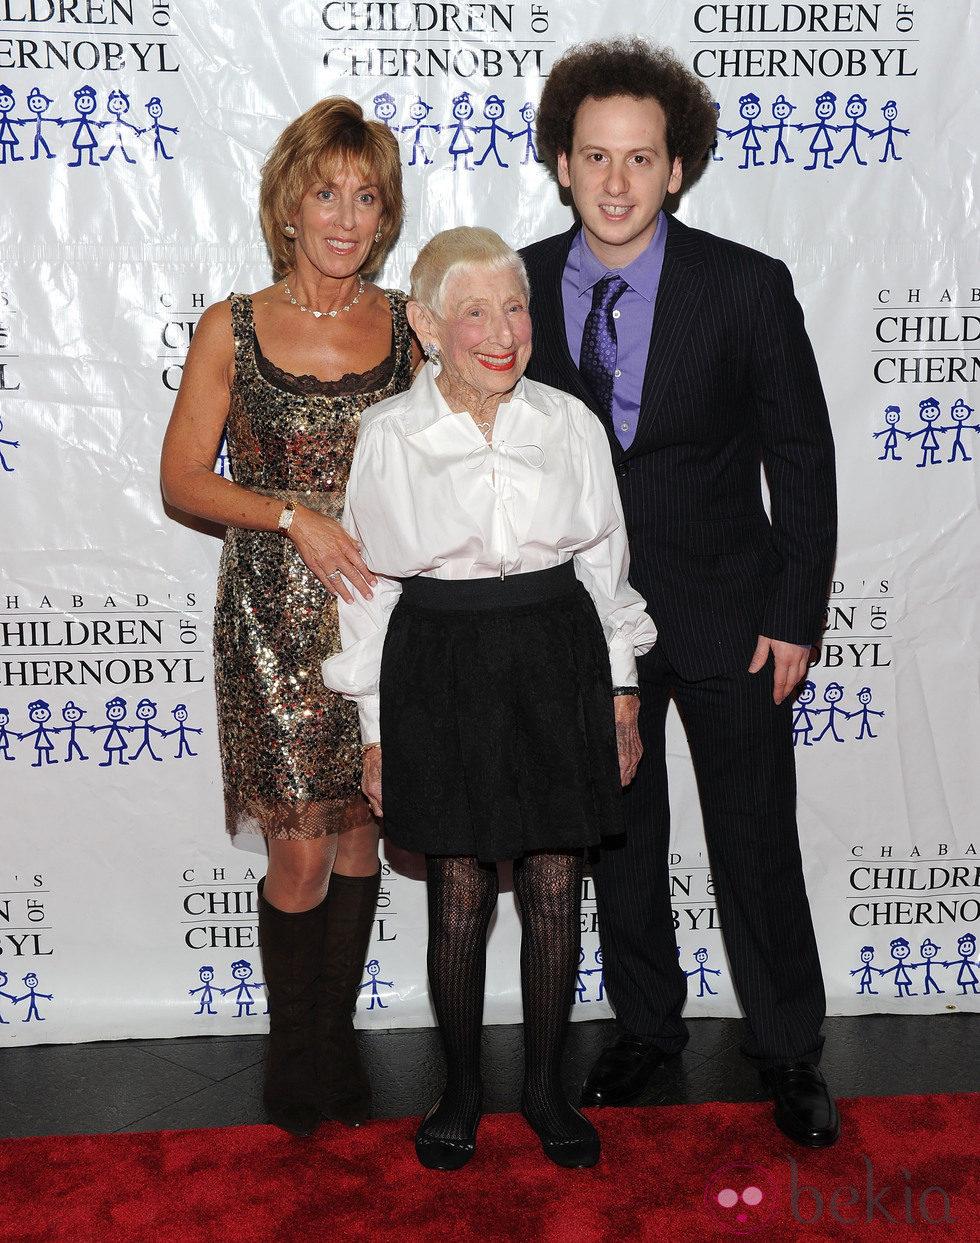 Nancy Spielberg, Leah Adler y Josh Sussman en la gala 'Children at heart'